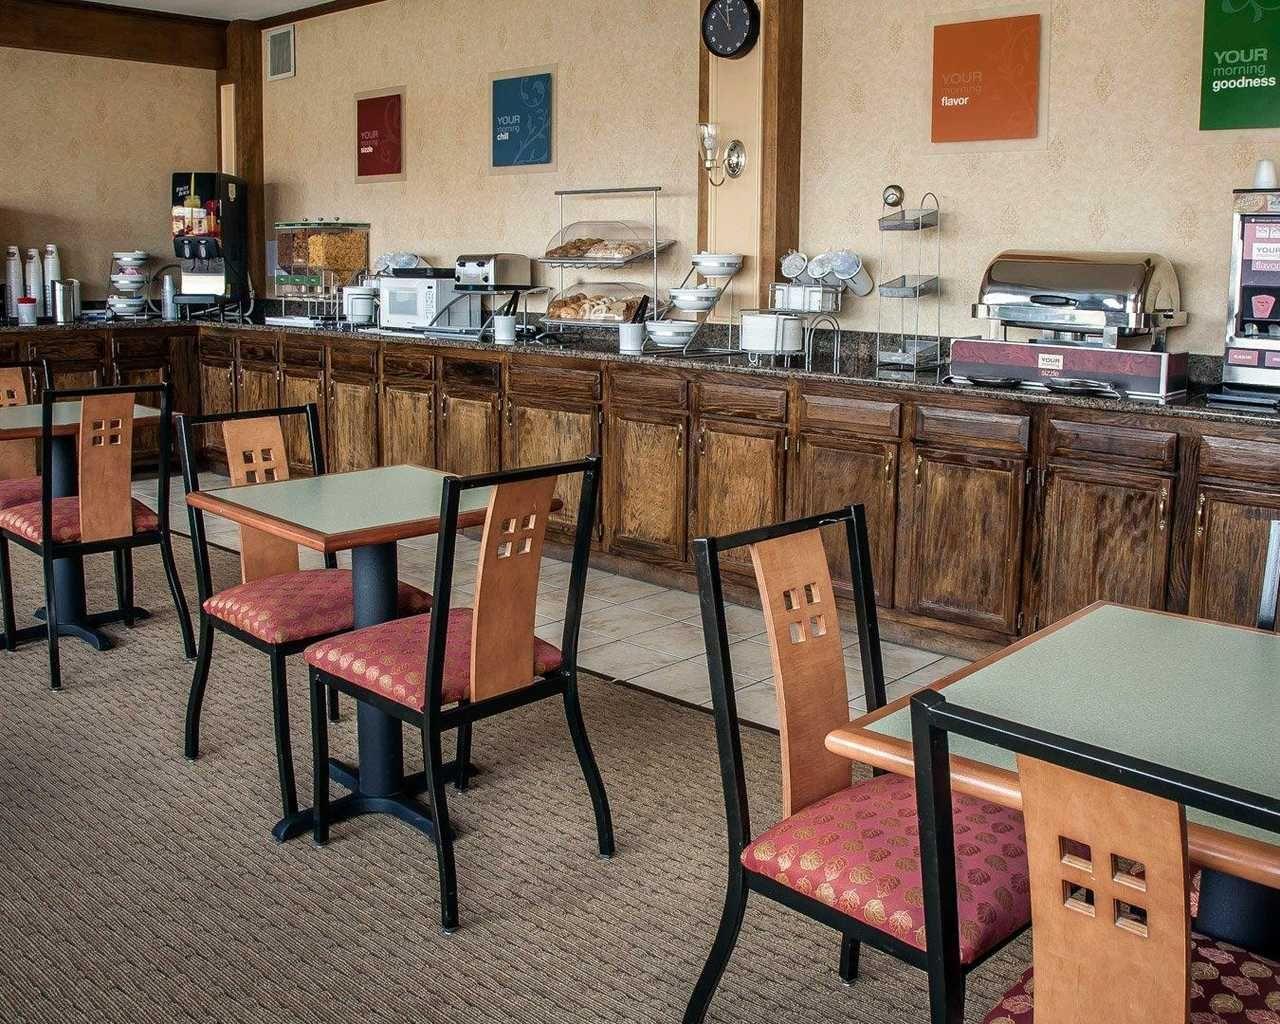 Get Direction To Quality Inn Seekonk Hotel Near Roger Williams